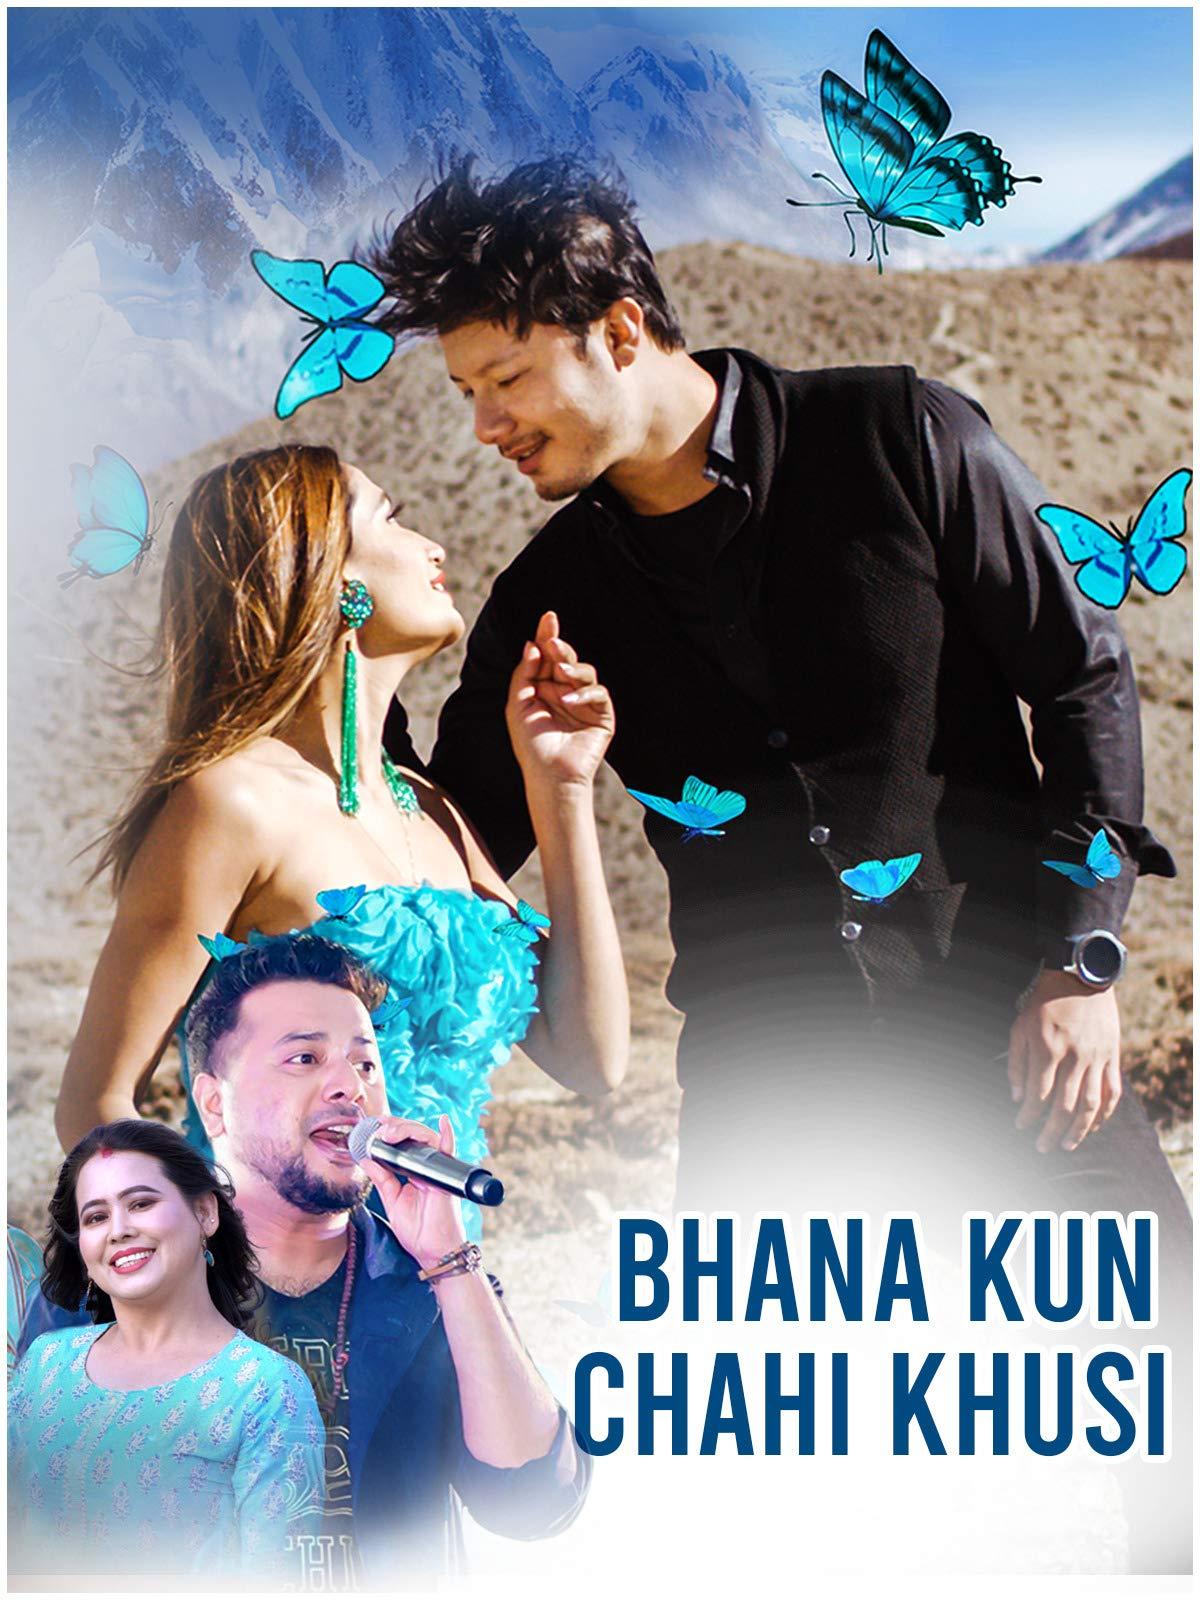 Bhana Kun Chahi Khusi